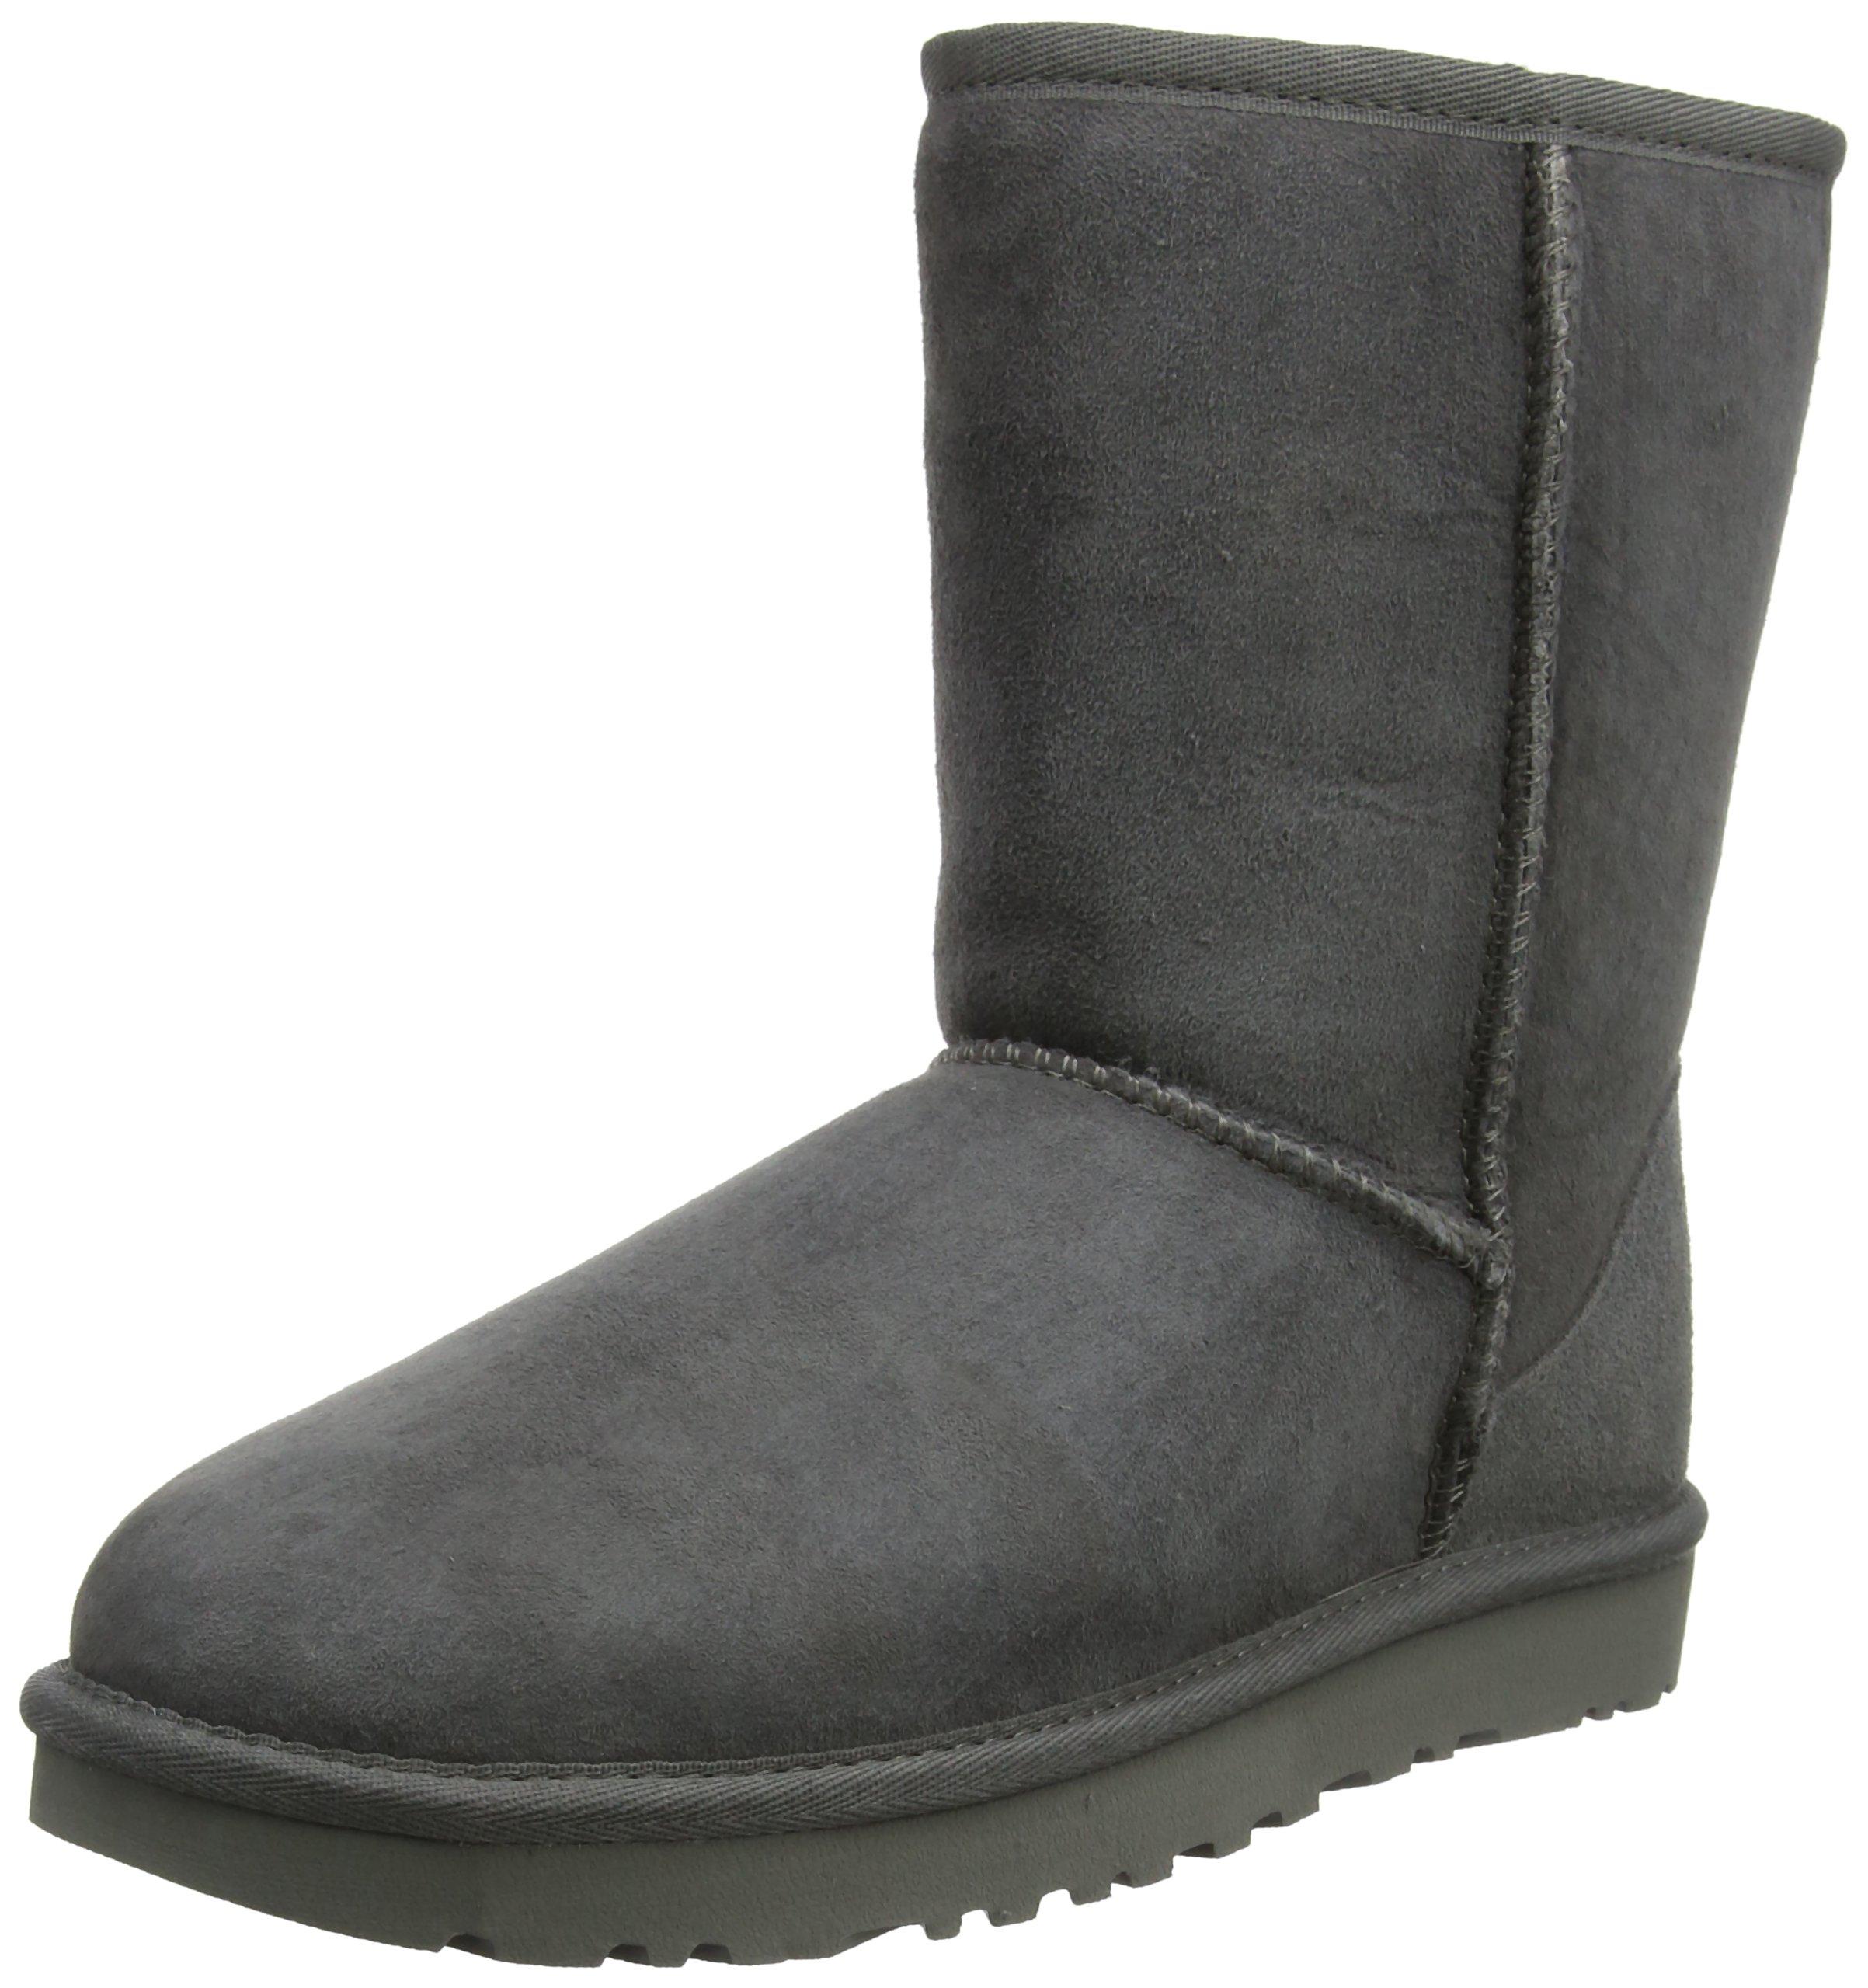 UGG Australia Women's Classic Short Slouch Boots